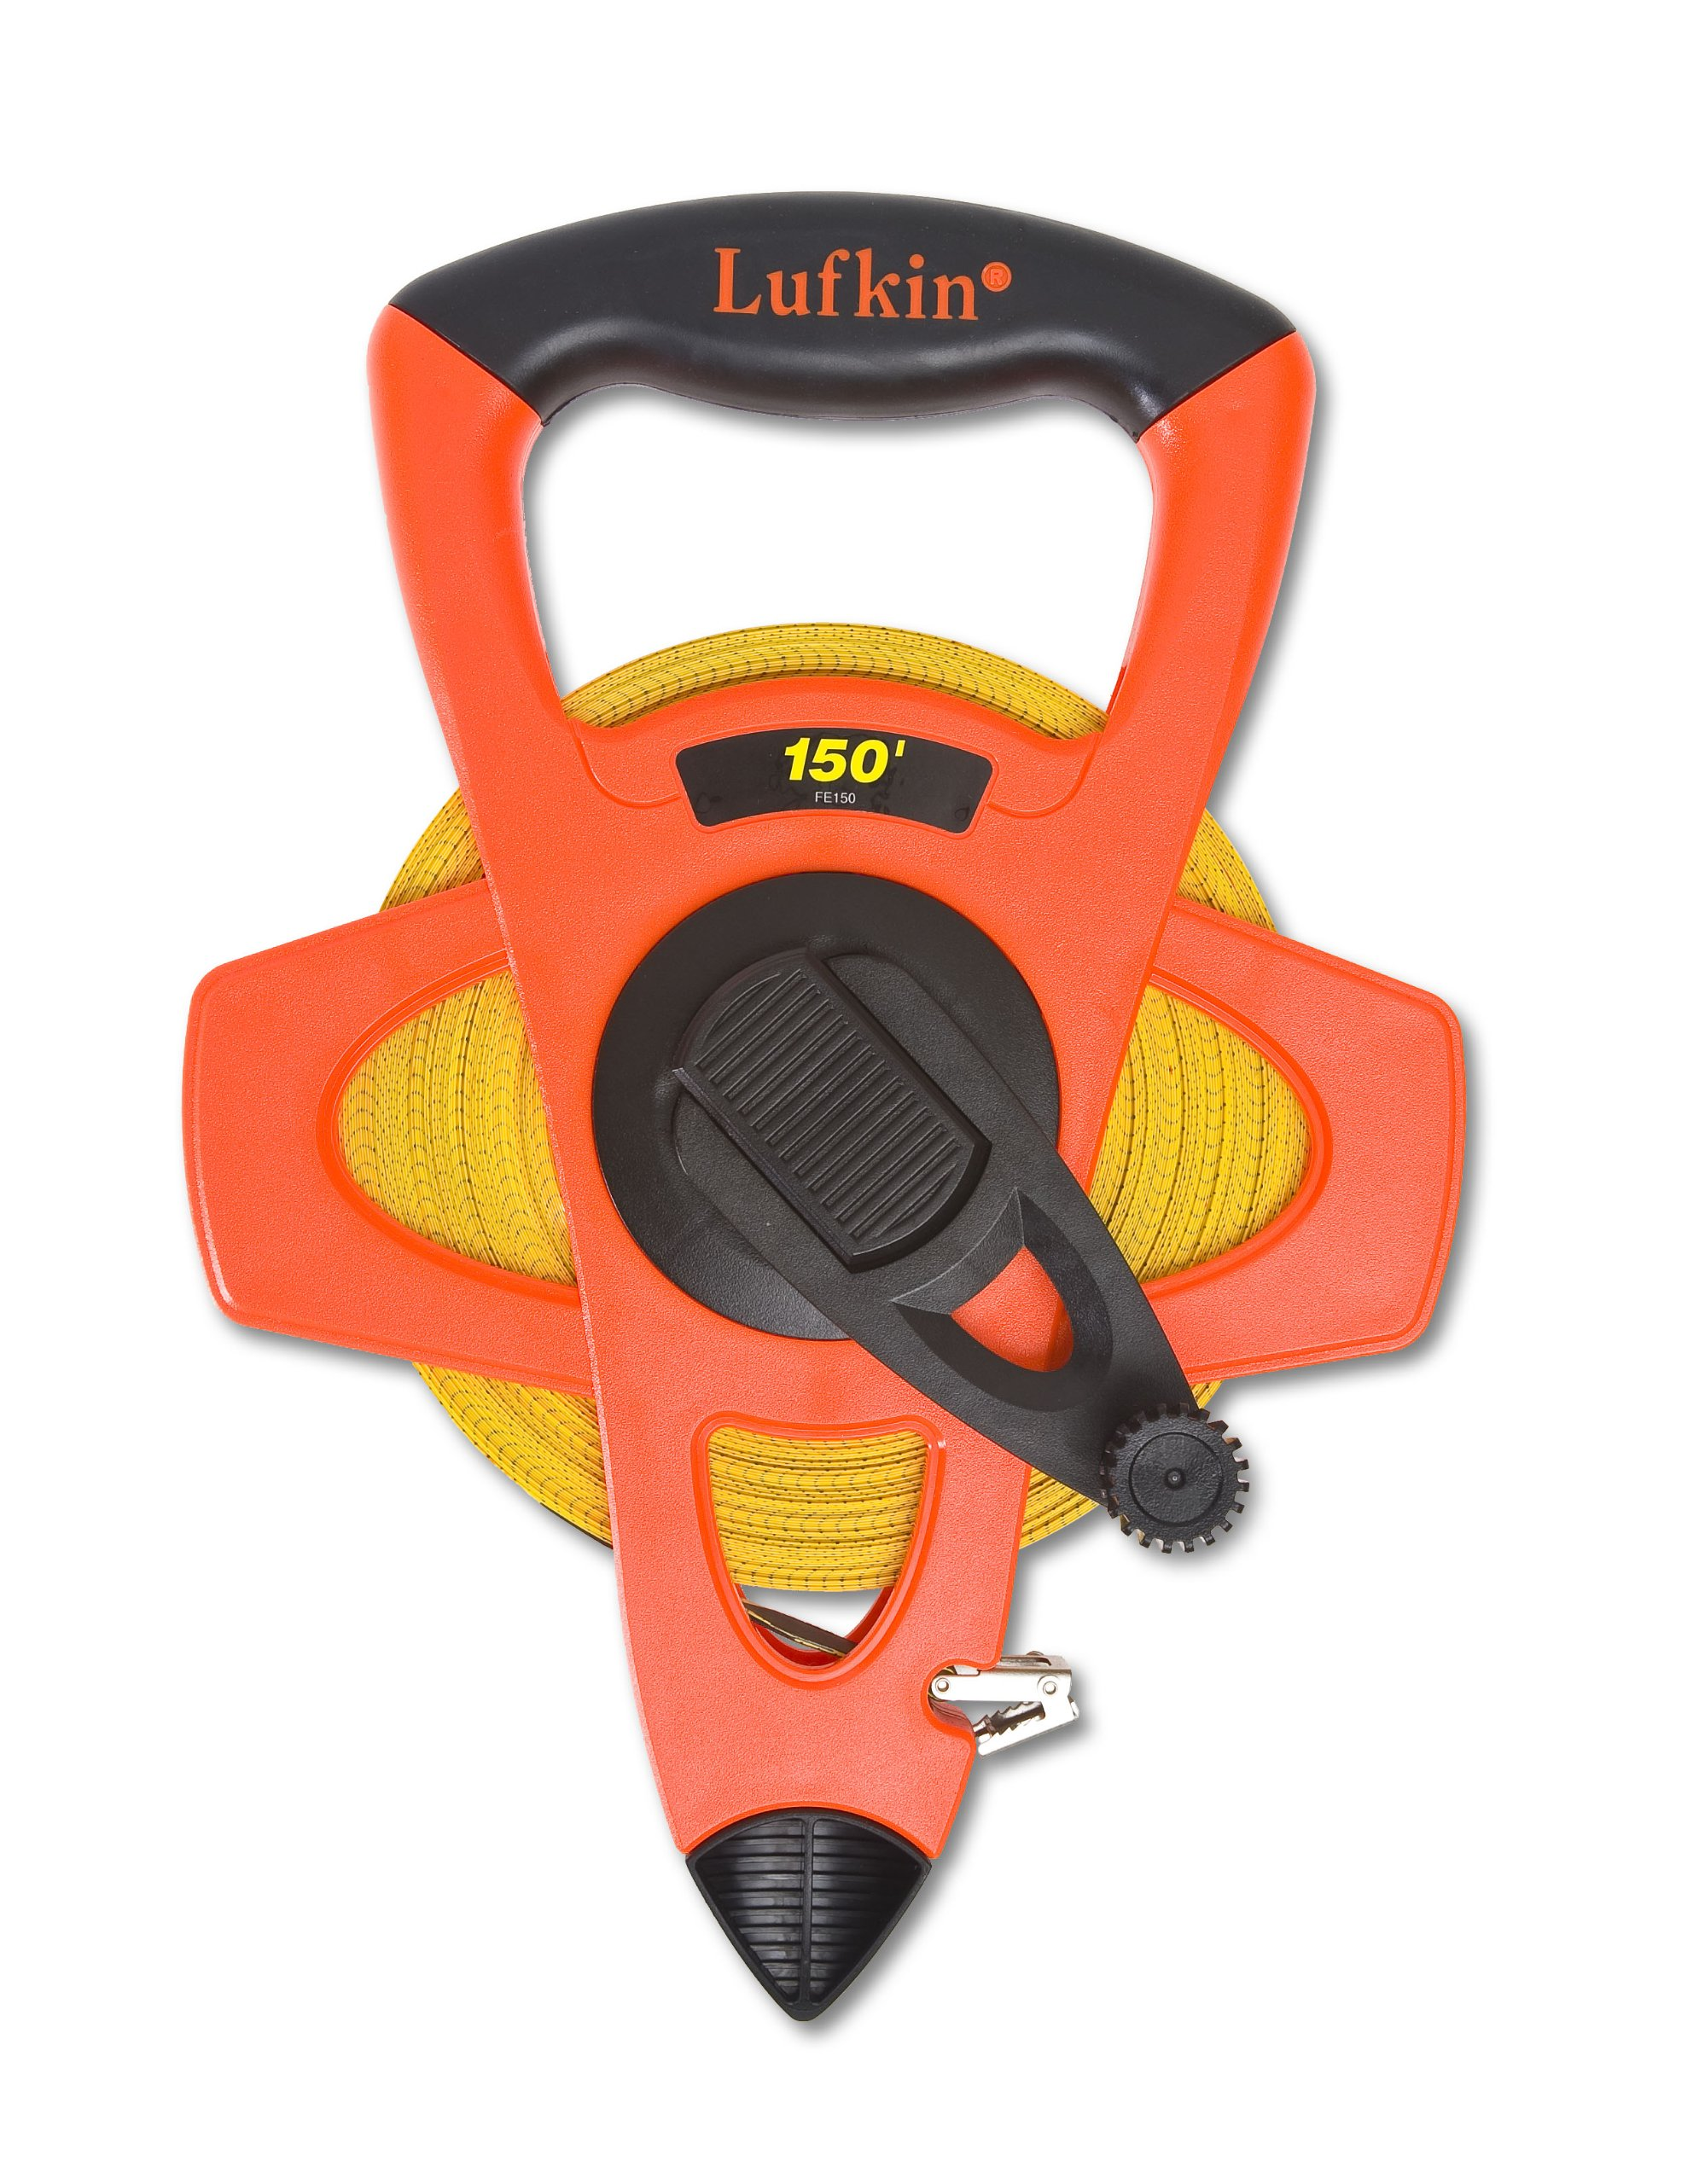 Lufkin FE150 1/2-Inch x 150-Foot Hi-Viz Orange Fiberglass Tape